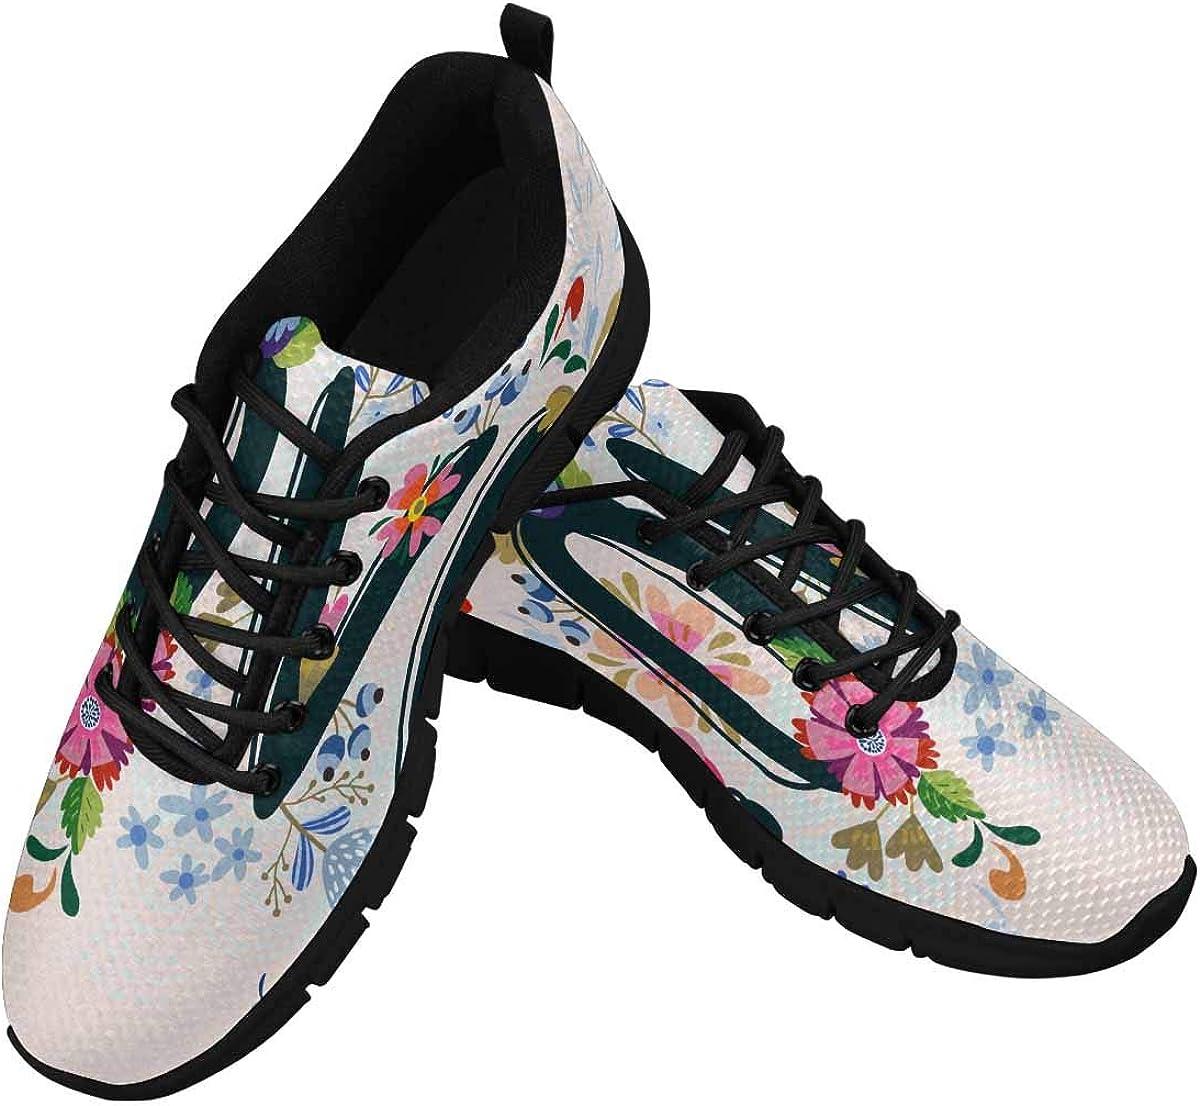 INTERESTPRINT Love Flowers Women's Lace Up Breathable Non Slip Sneaker